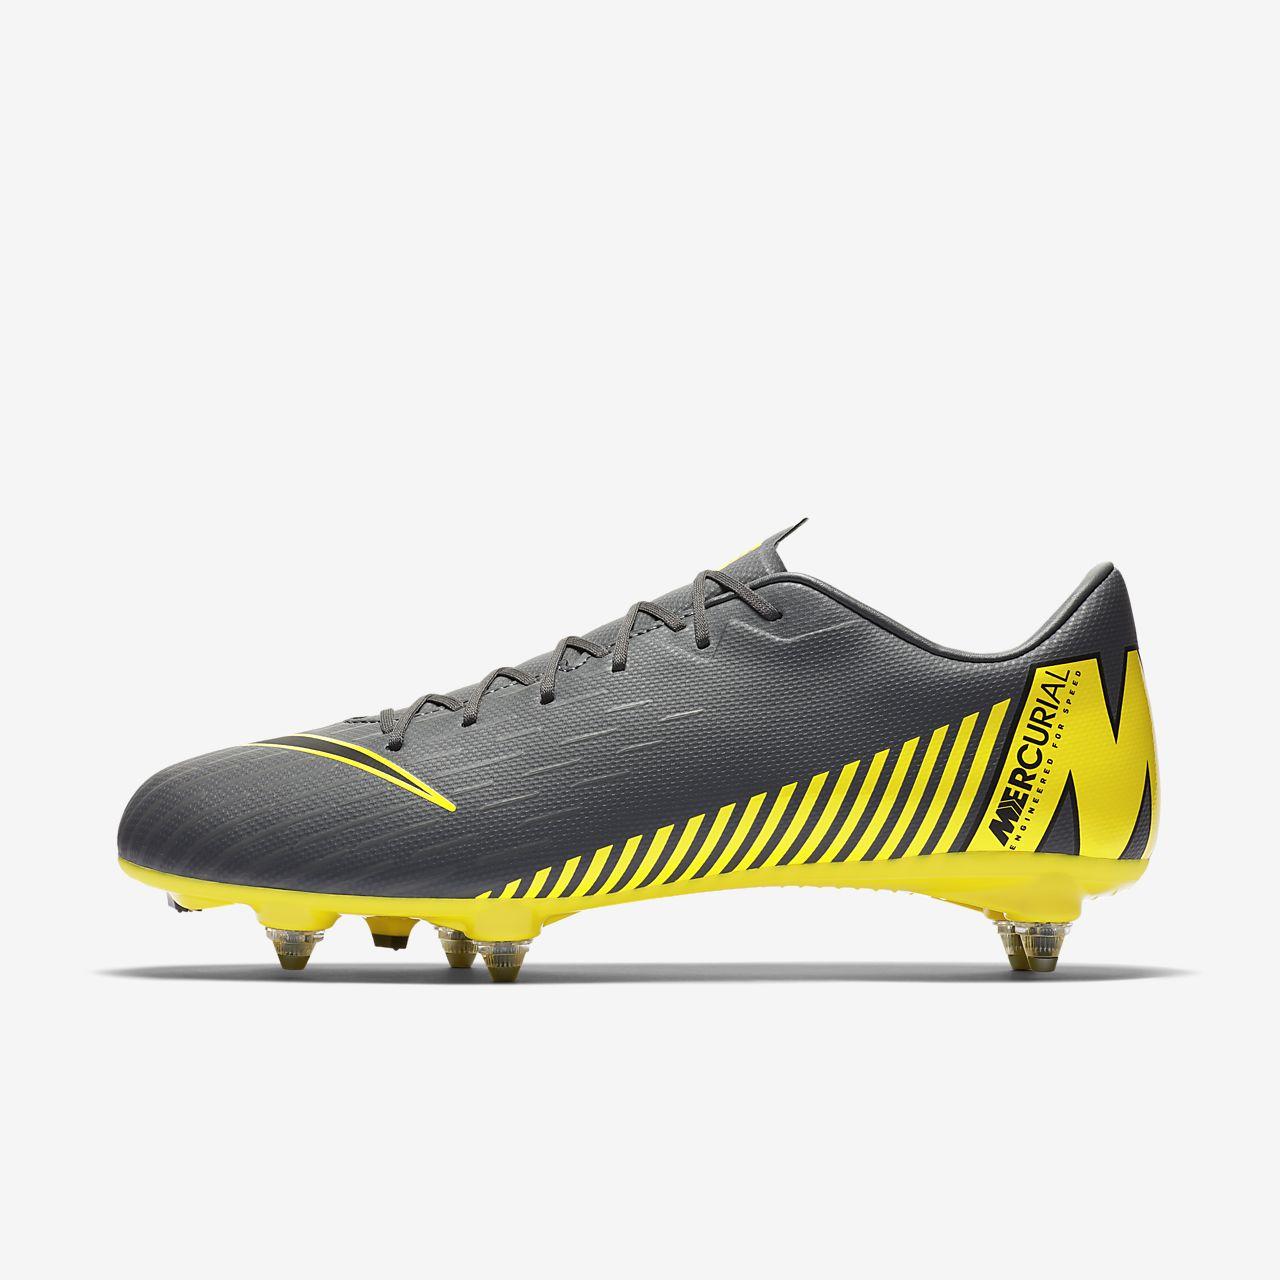 cheap for discount e6802 9ebe8 ... Chaussure de football à crampons pour terrain gras Nike Mercurial Vapor  XII Academy SG-PRO